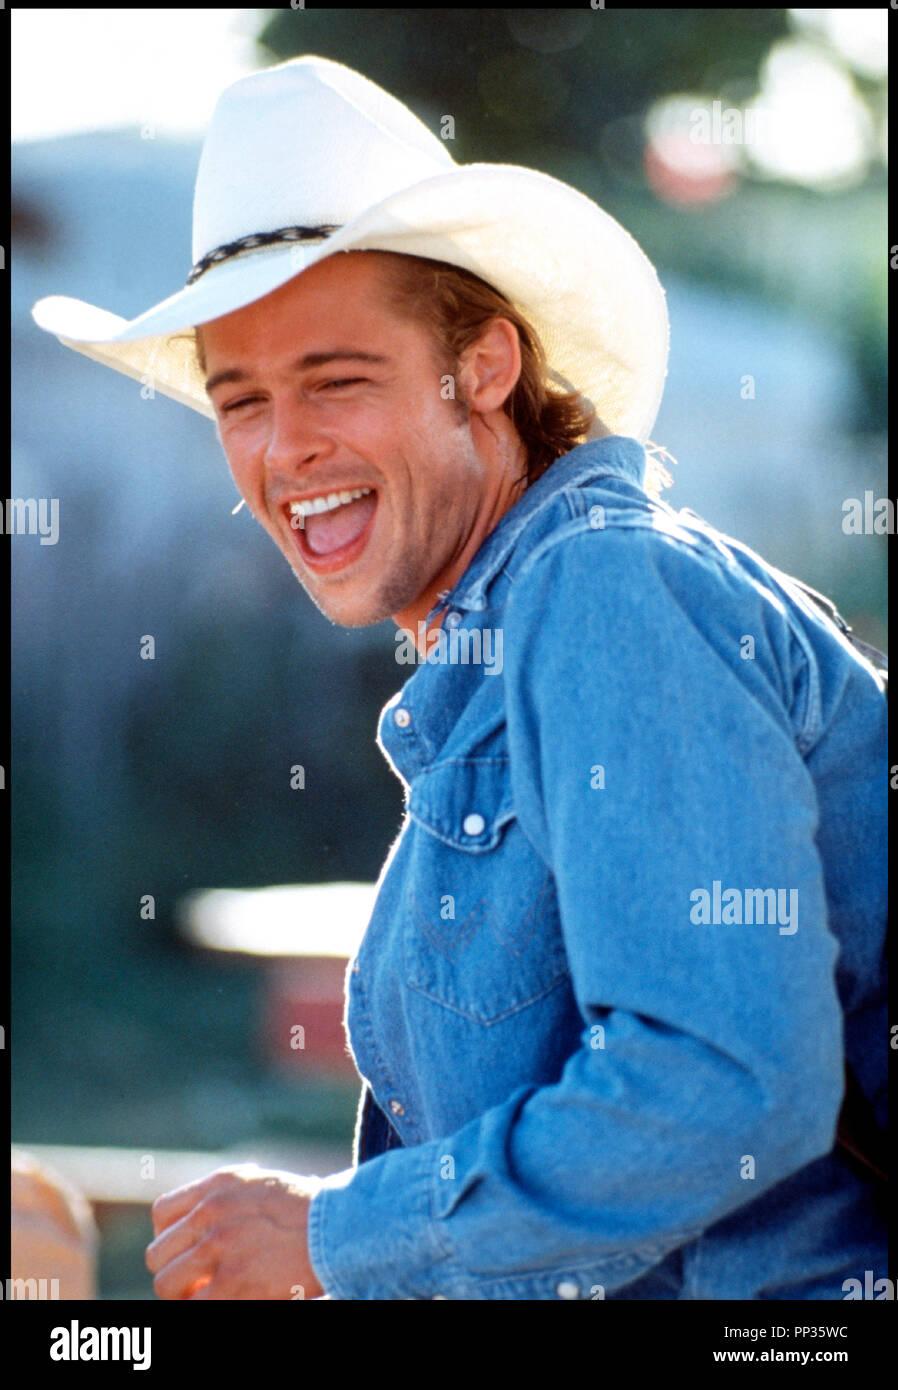 e576d4c0978 Prod DB © MGM - Pathe Entertainment   DR THELMA ET LOUISE (THELMA AND  LOUISE) de Ridley Scott 1991 USA avec Brad Pitt stetson